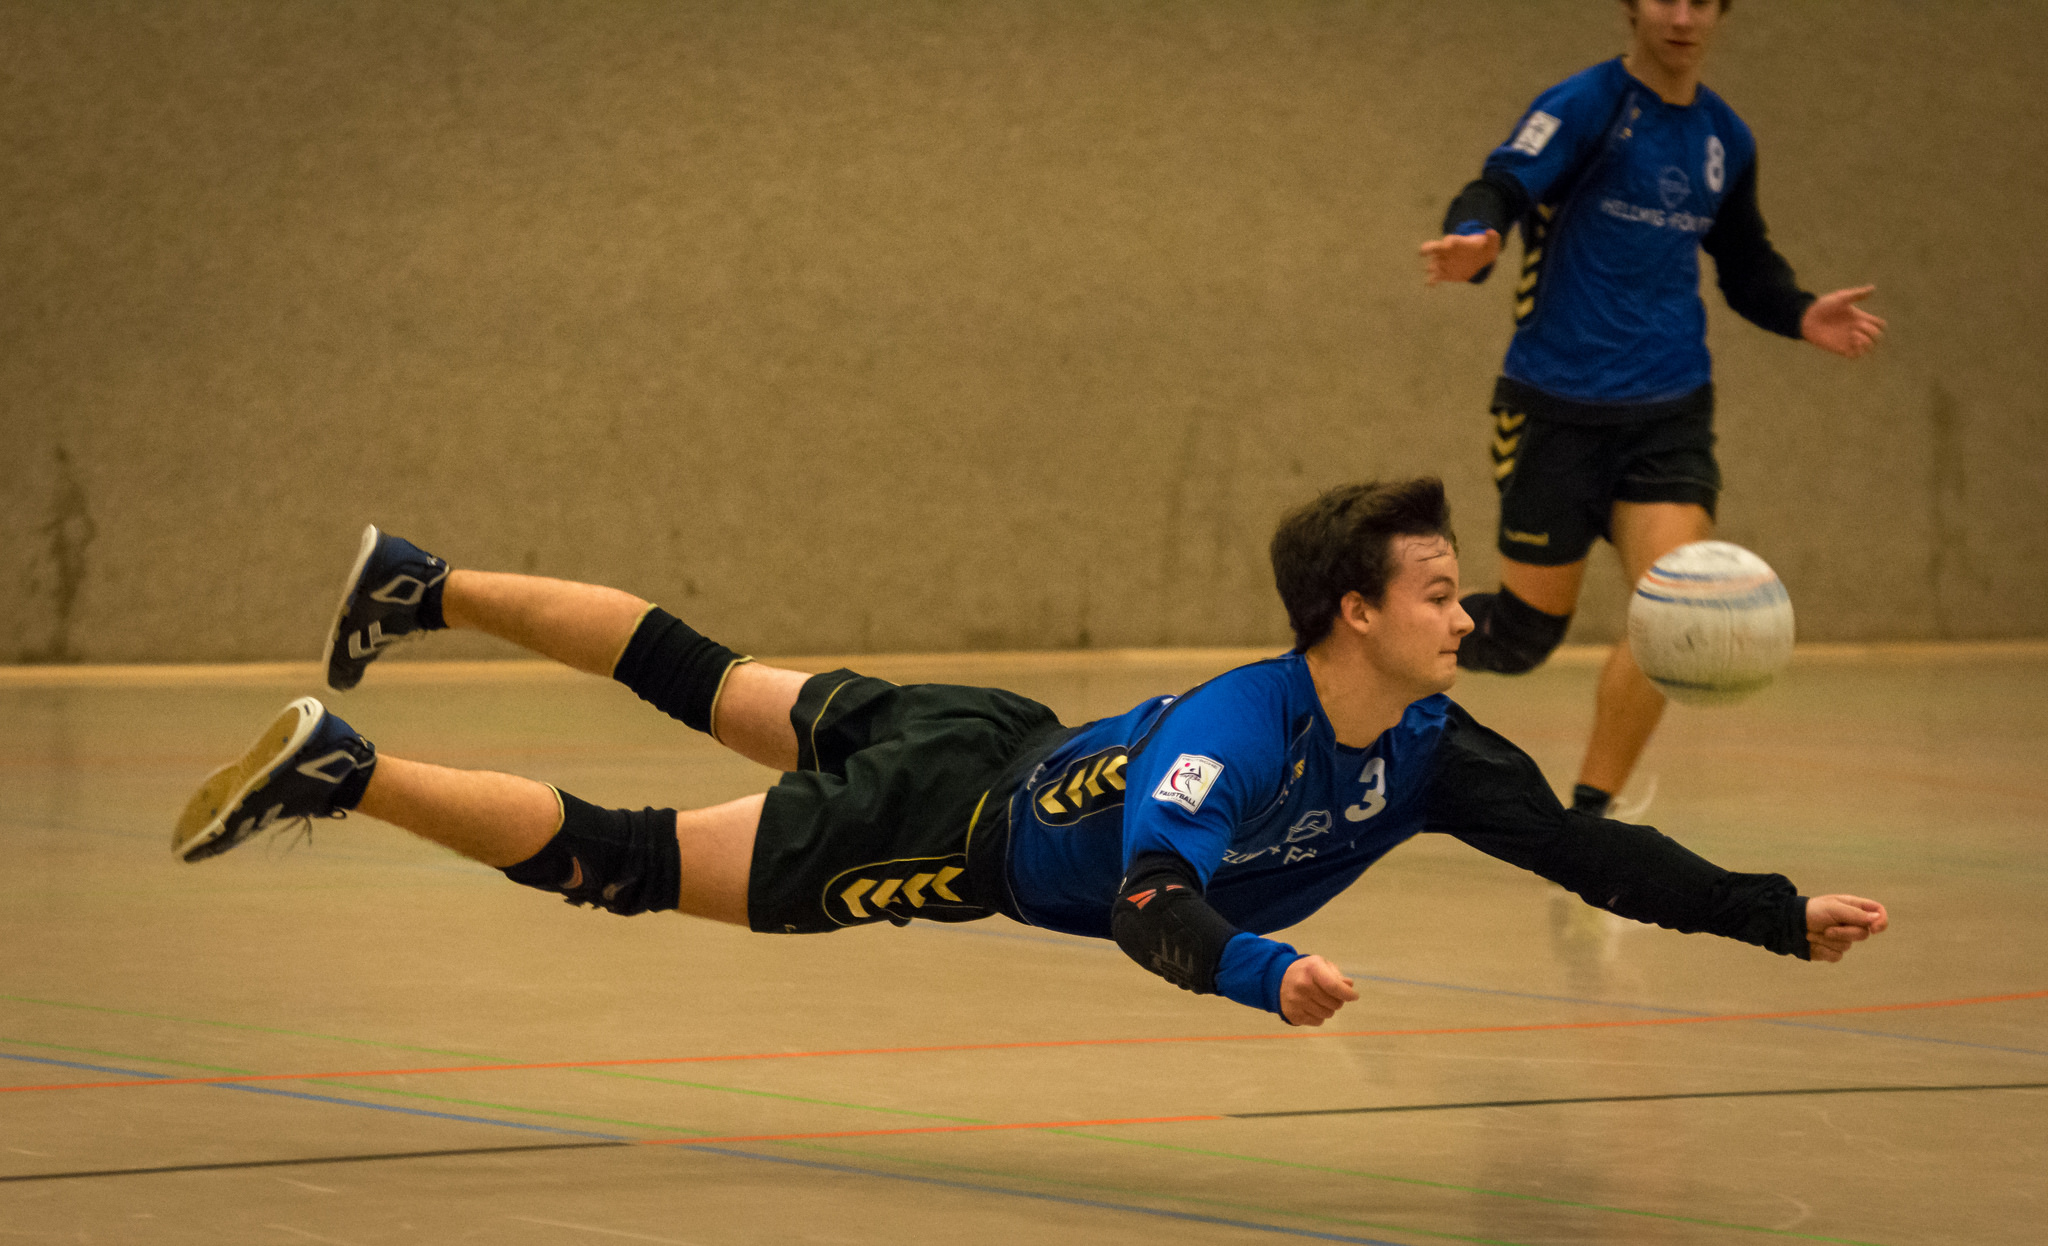 Der VfL Kellinghusen fliegt zum Saisonstart an die Tabellenspitze. (Foto: DFBL/Schönwandt)